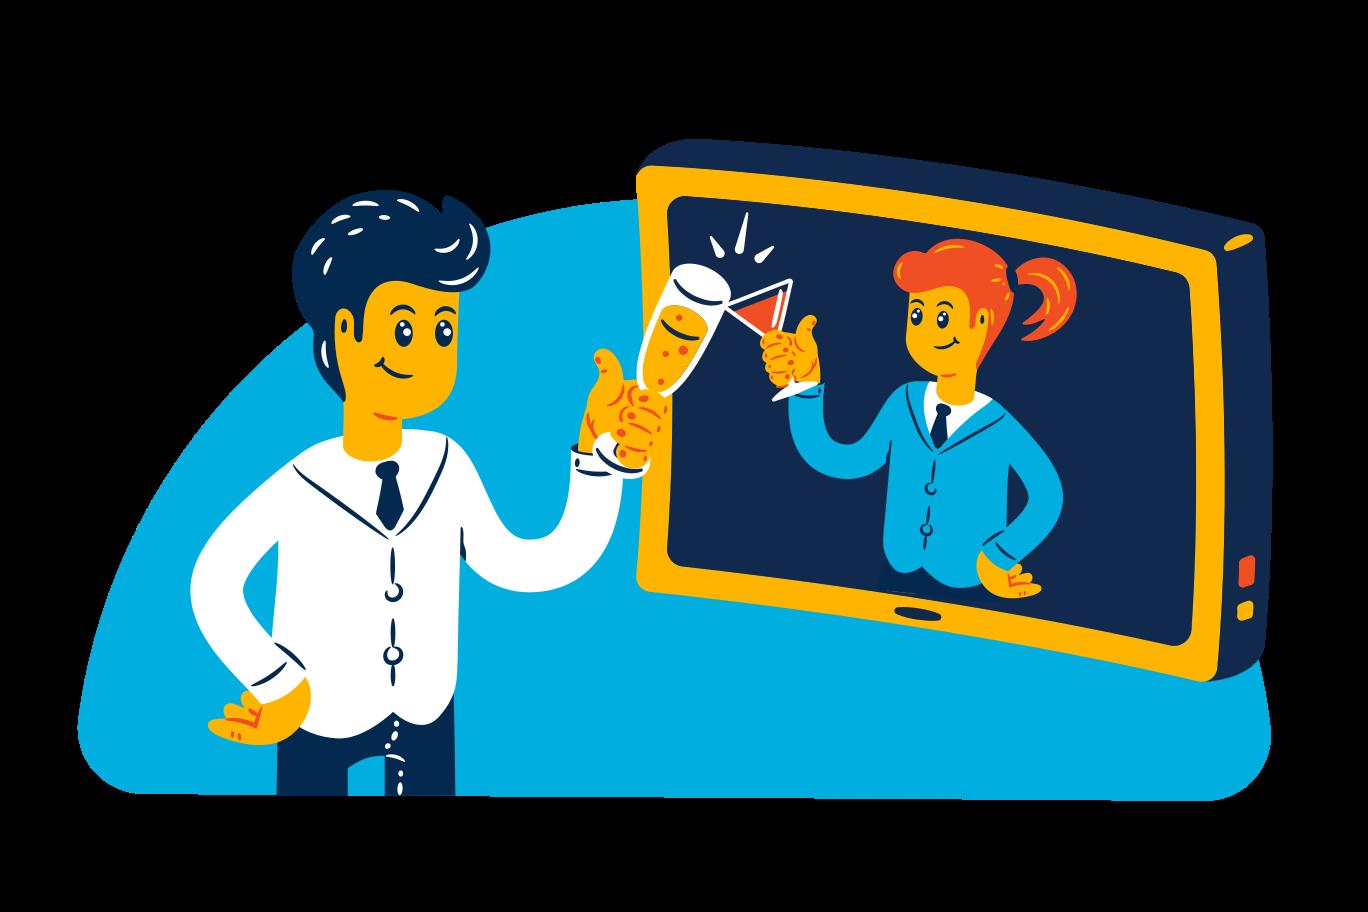 Online date Clipart illustration in PNG, SVG